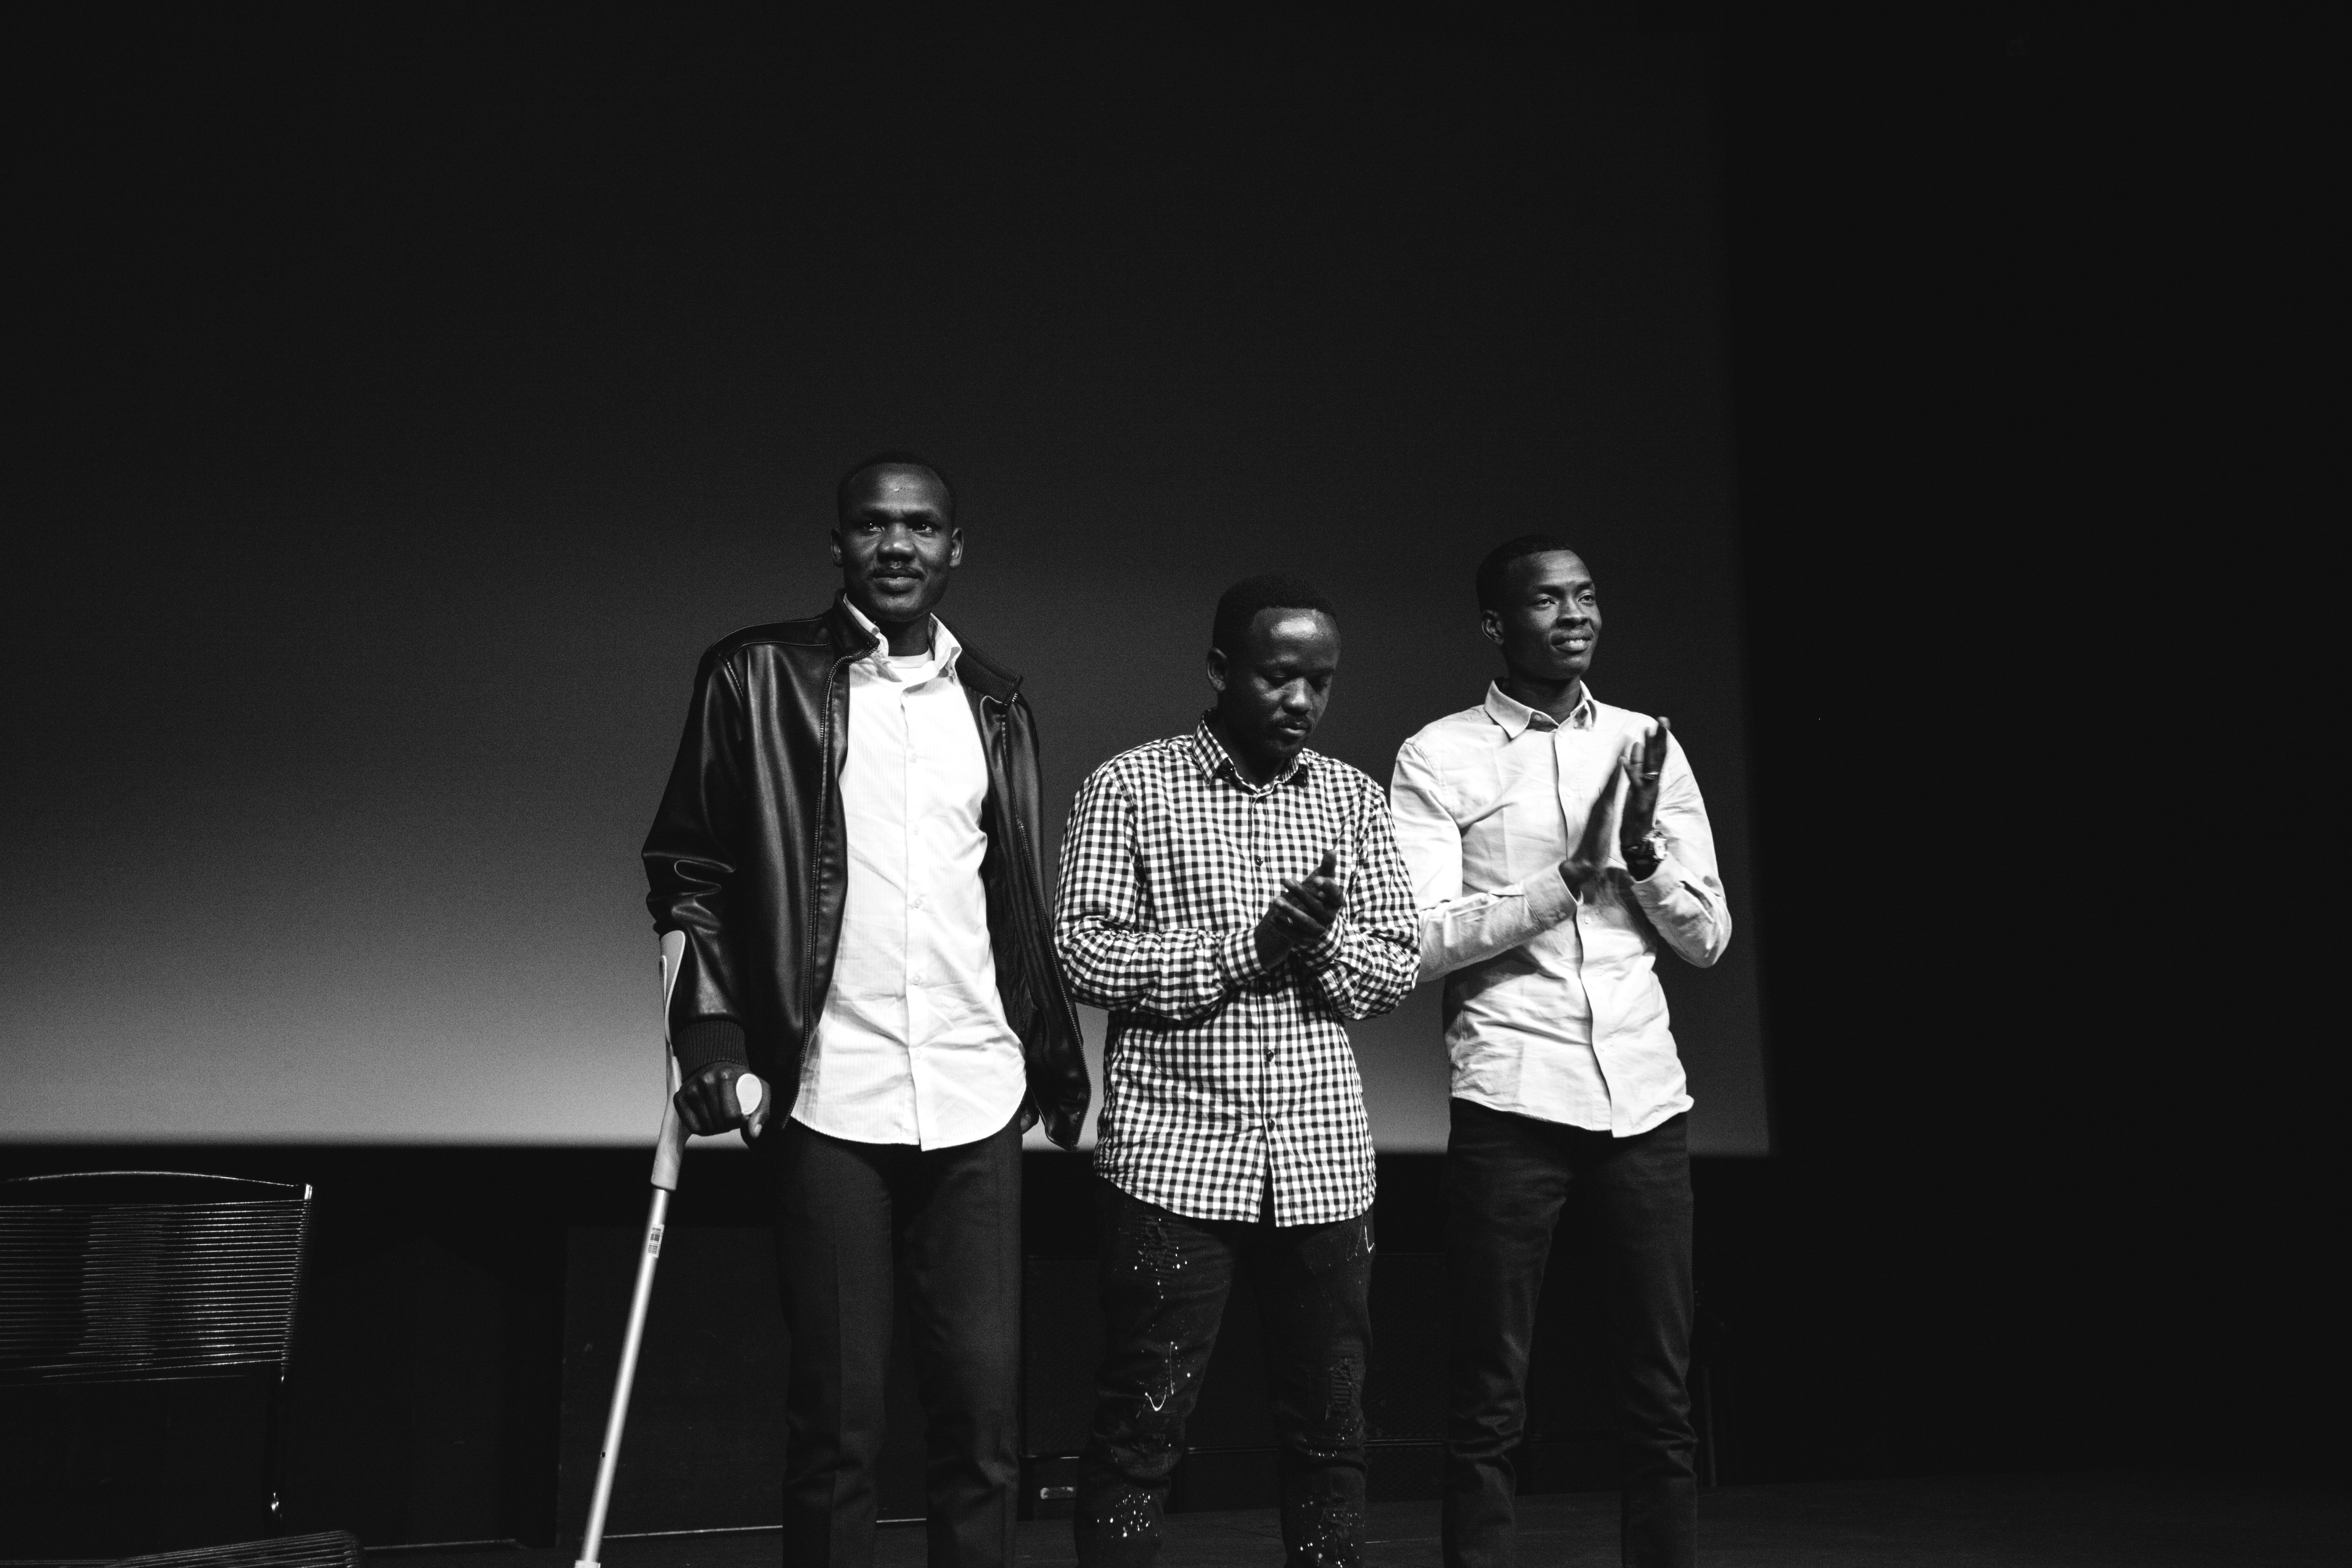 Documentaire asma - les soudanais